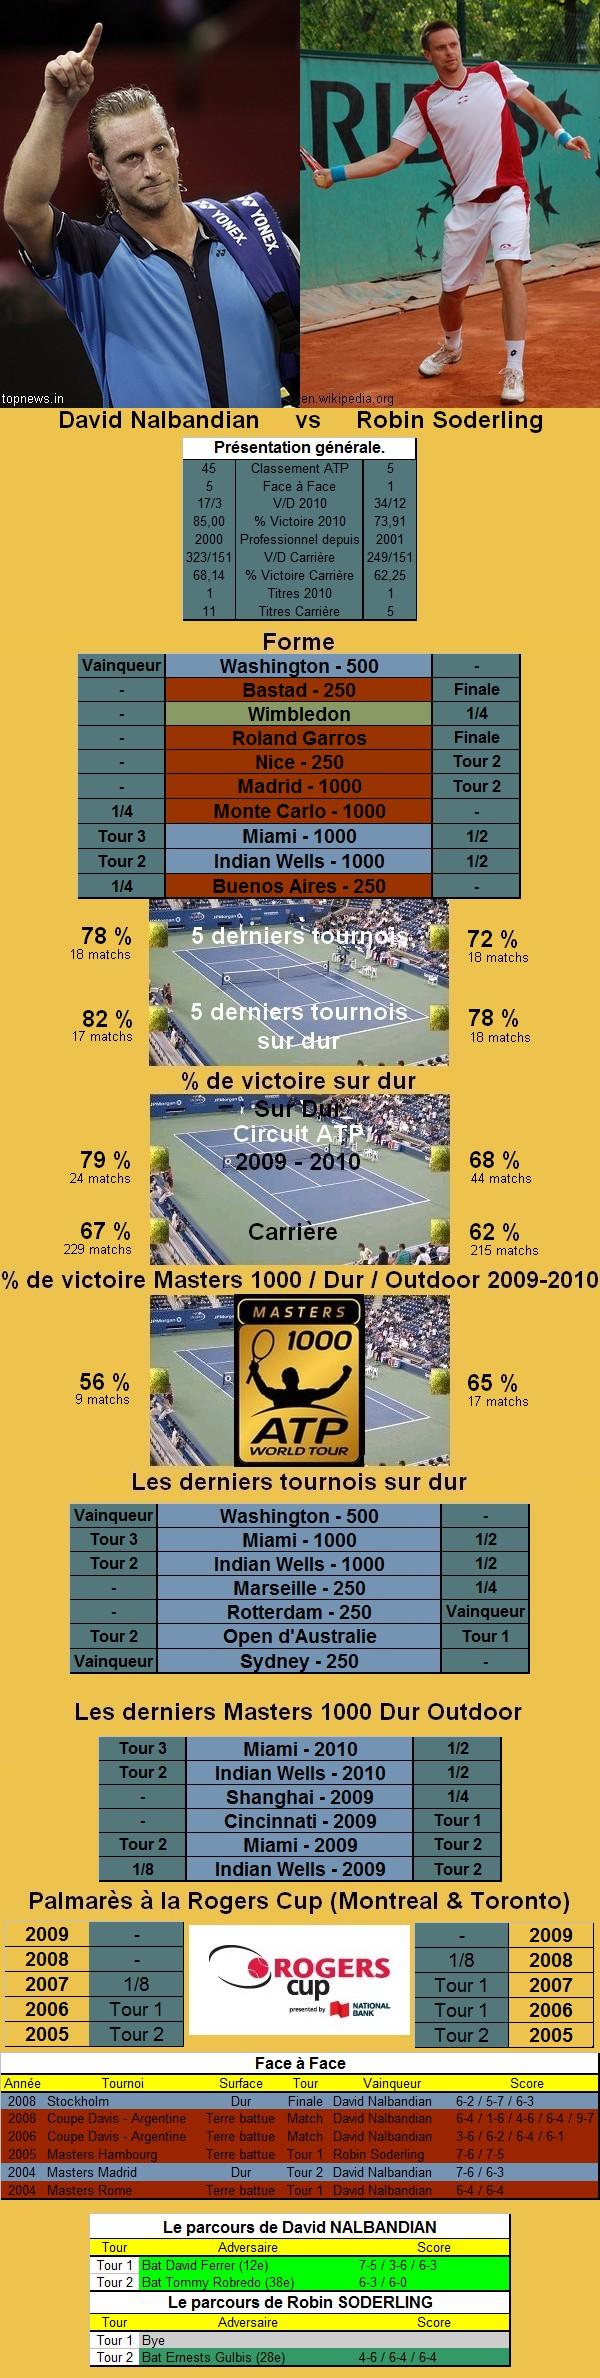 Statistiques tennis de Nalbandian contre Soderling à Toronto